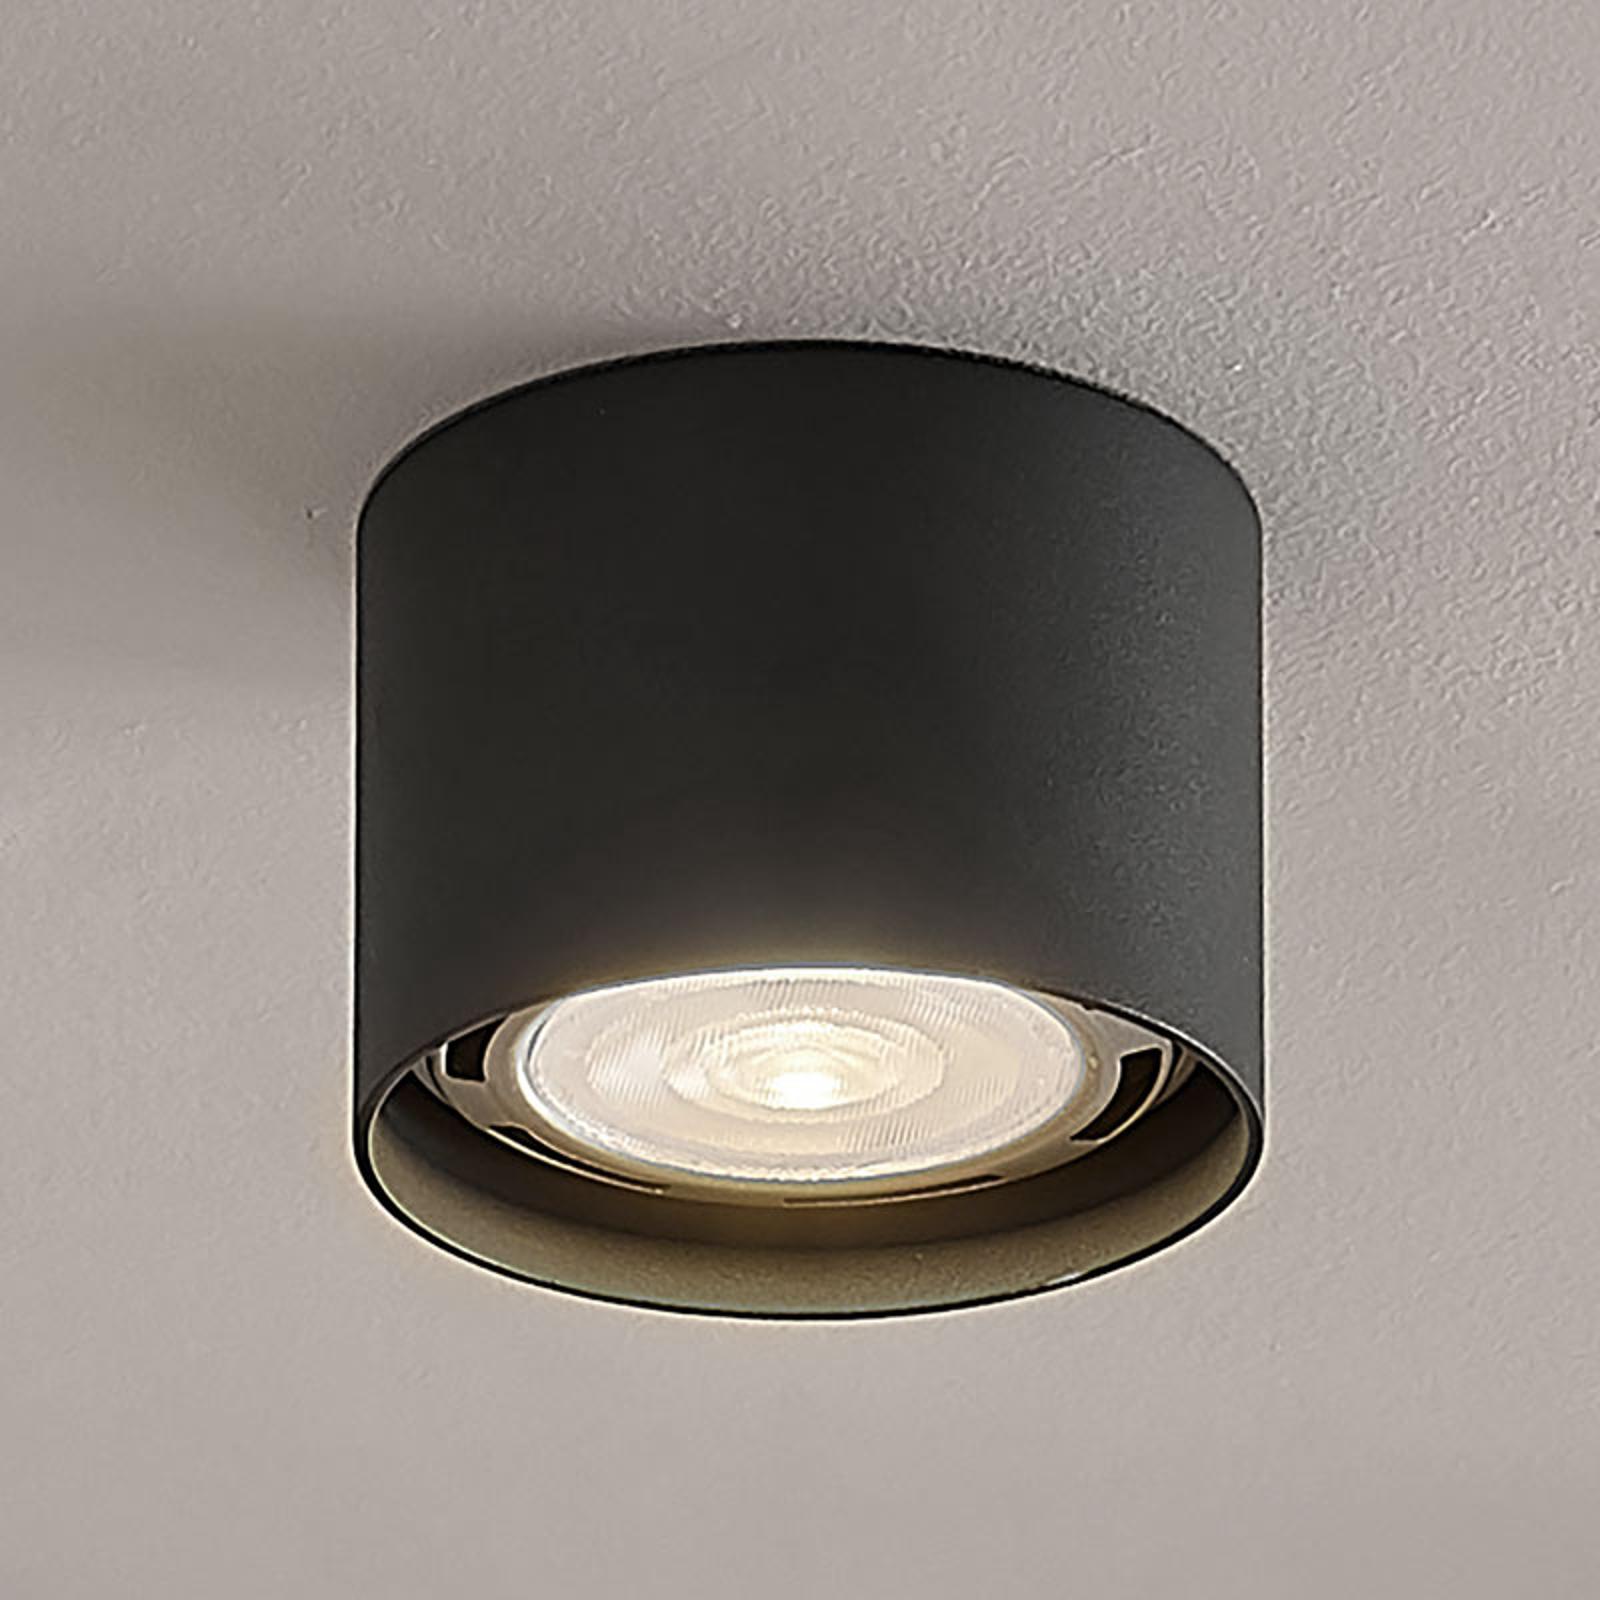 LED-takspot Mabel, rund, mørk grå